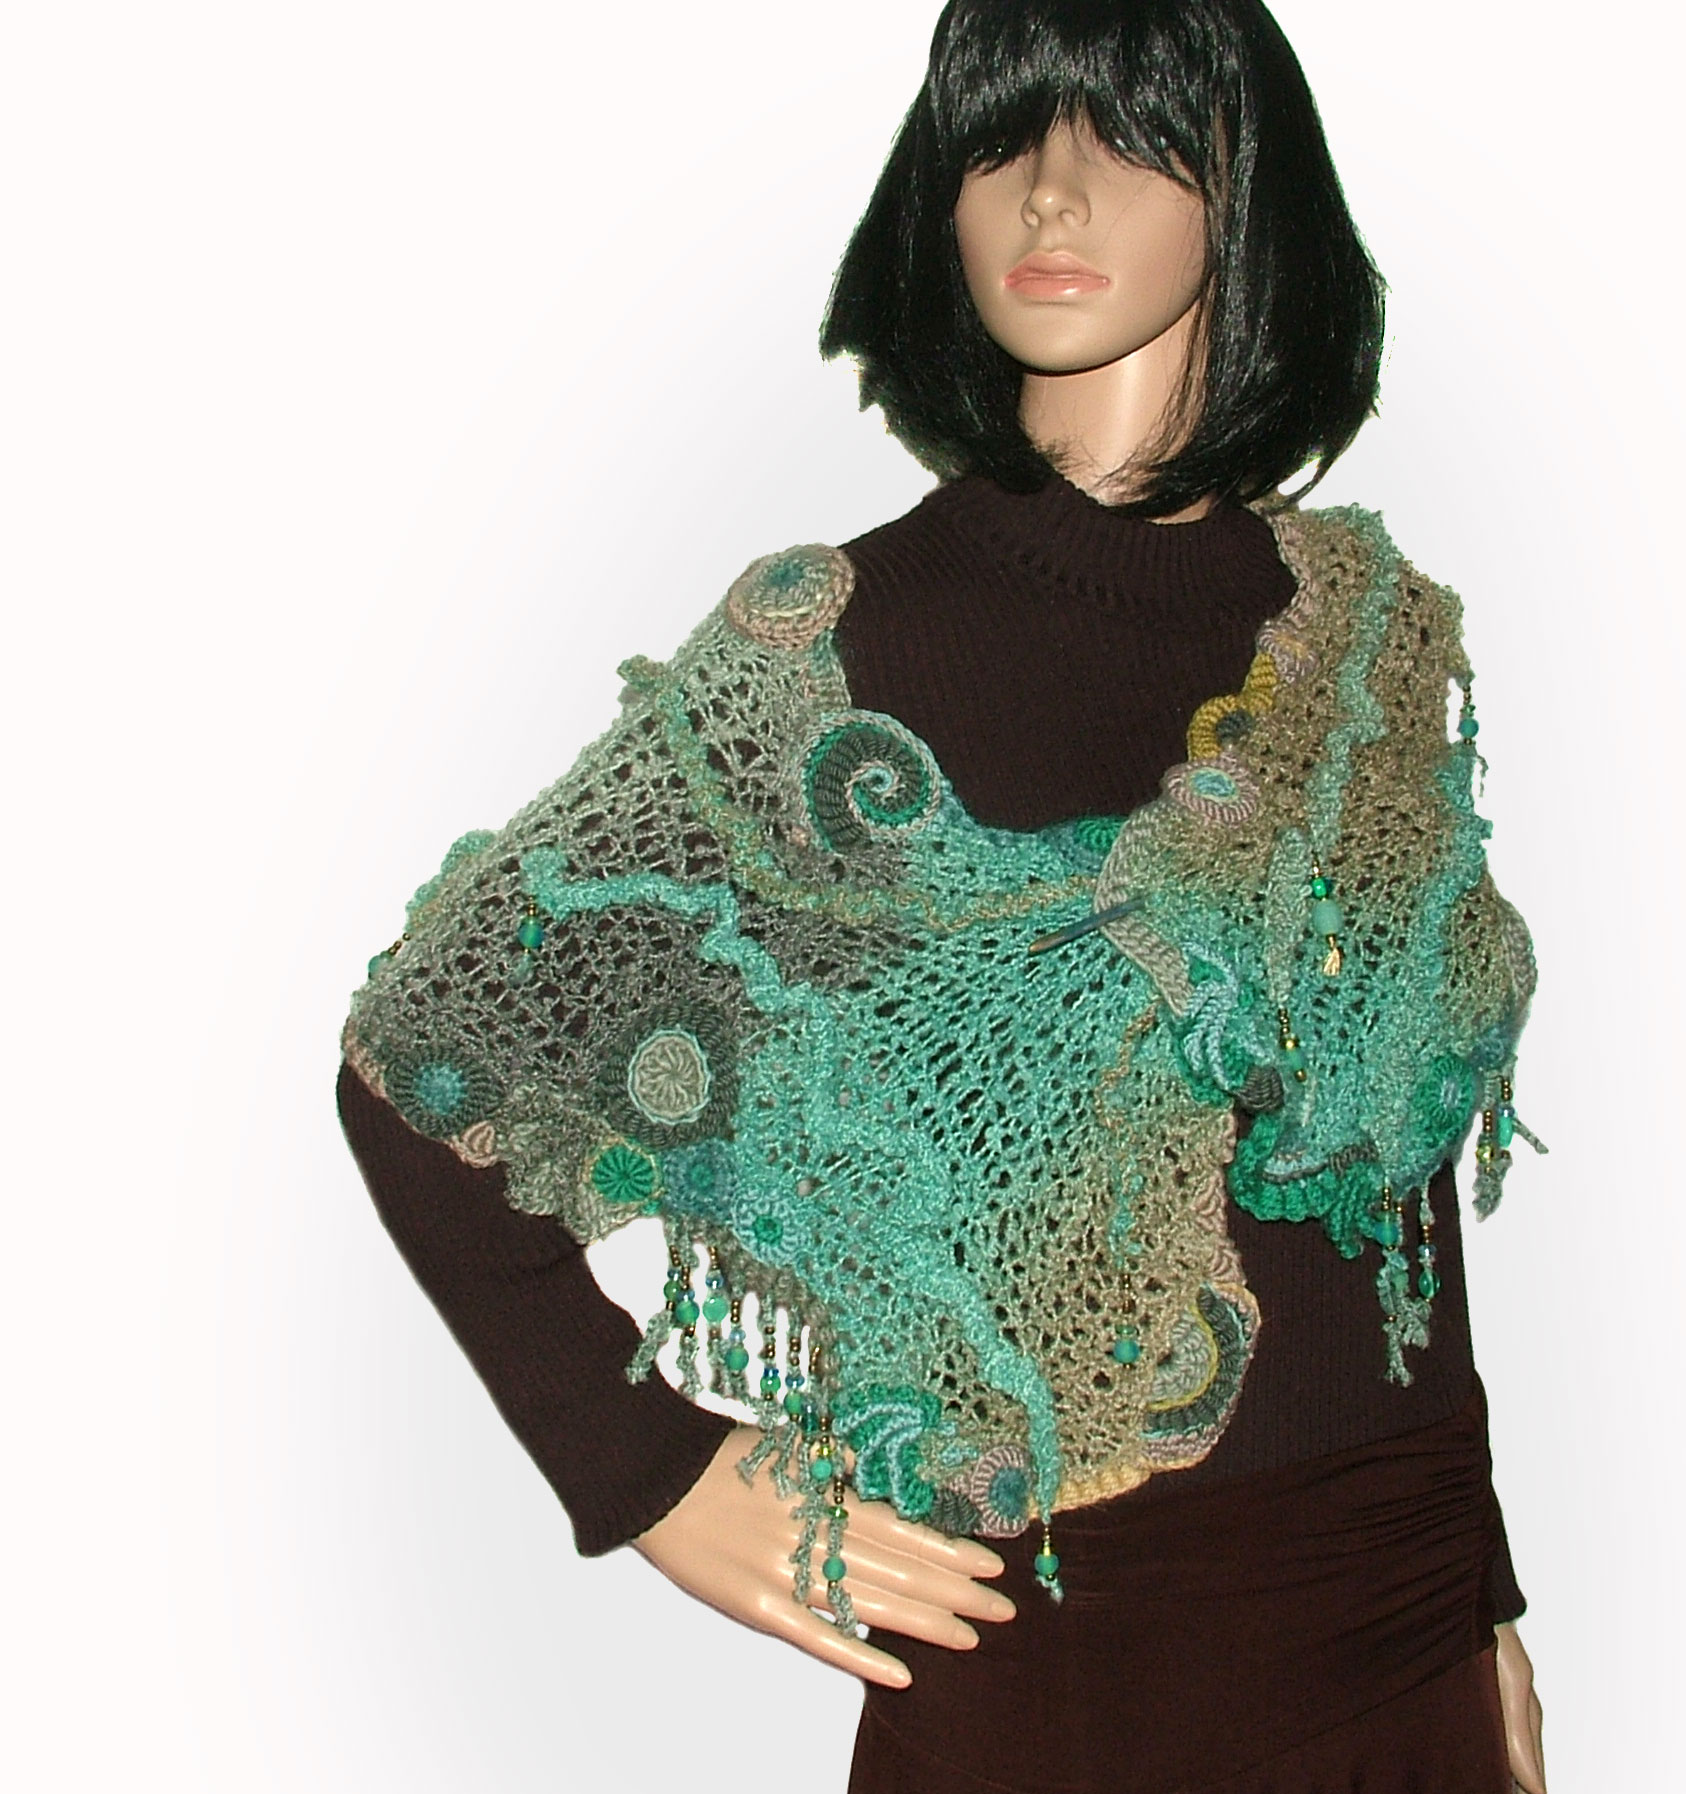 Freestyle Knit Freeform Crochet Scarf Shawl Wrap Renate